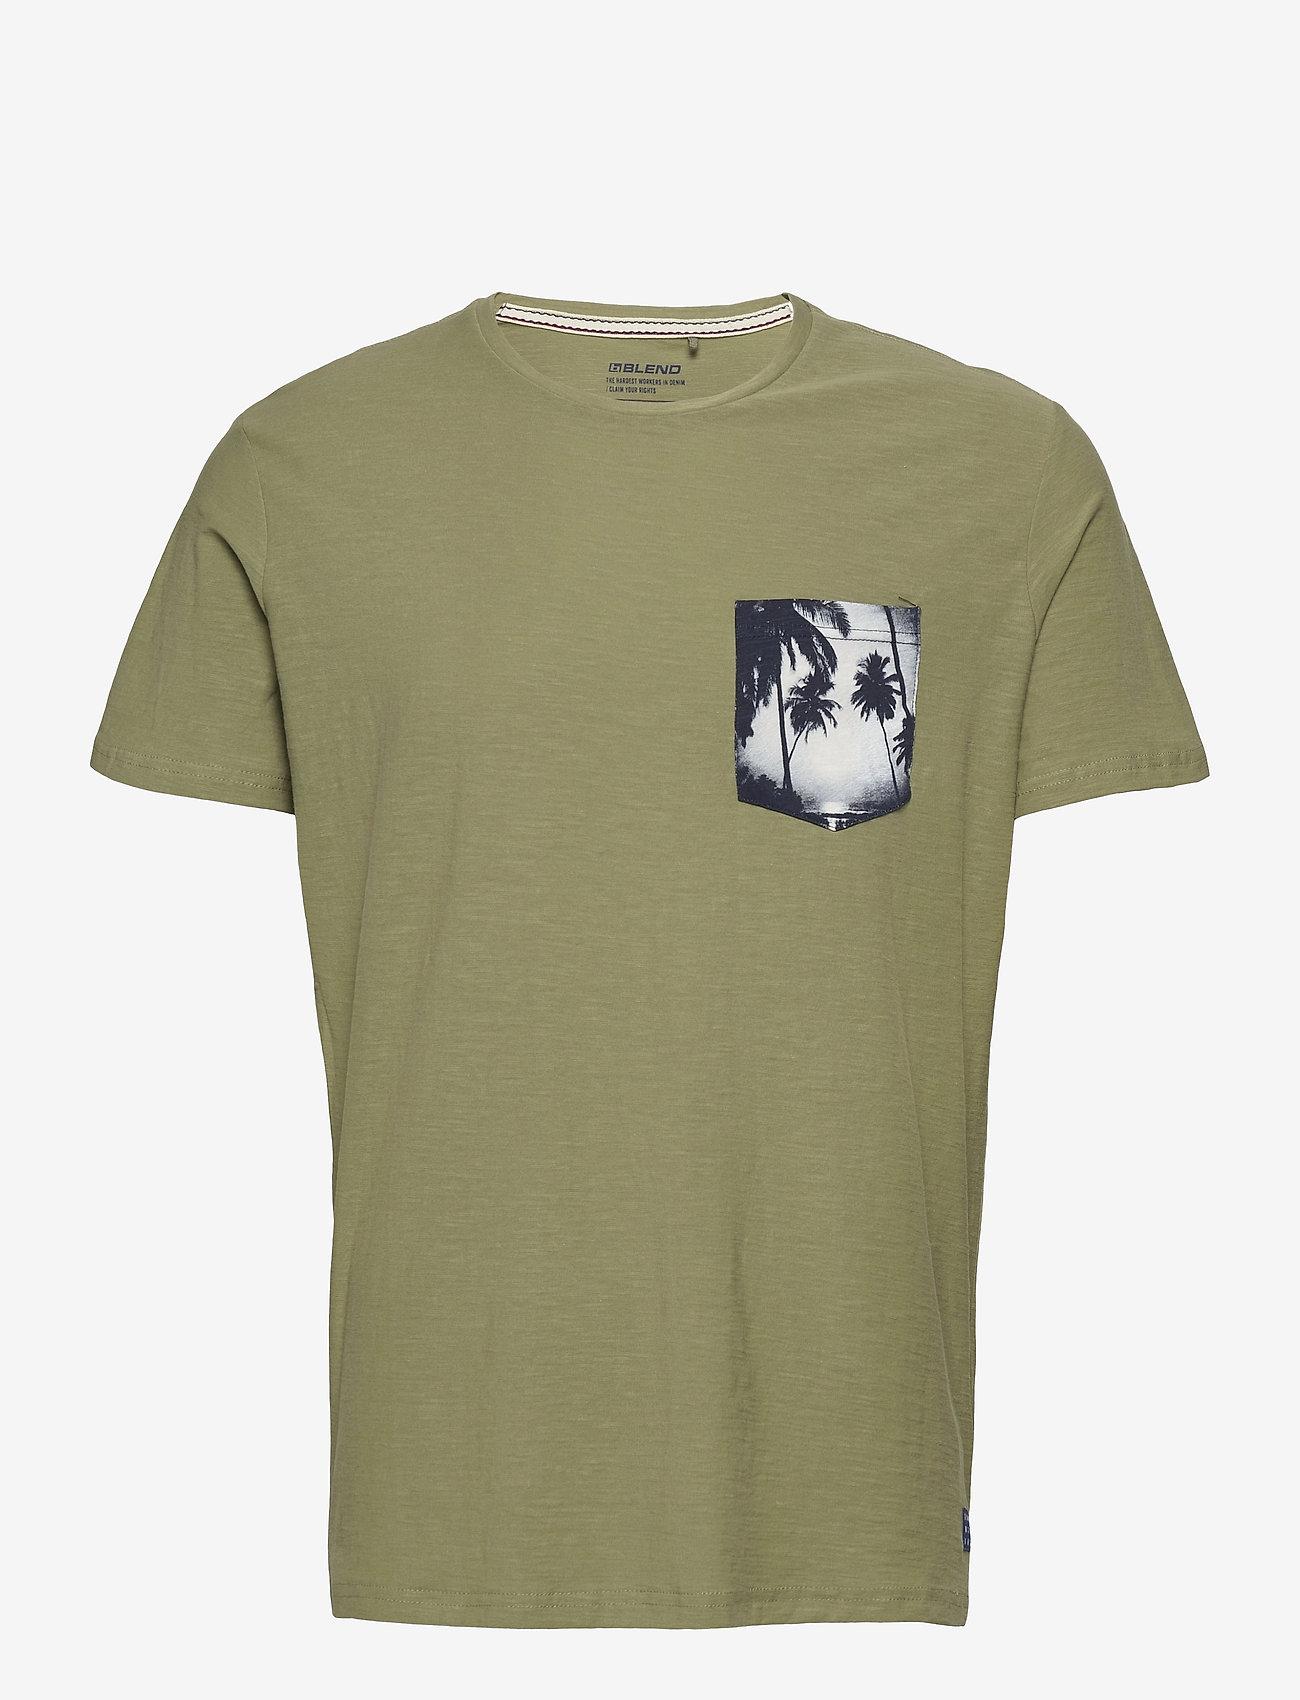 Blend - Tee - basic t-shirts - oil green - 0